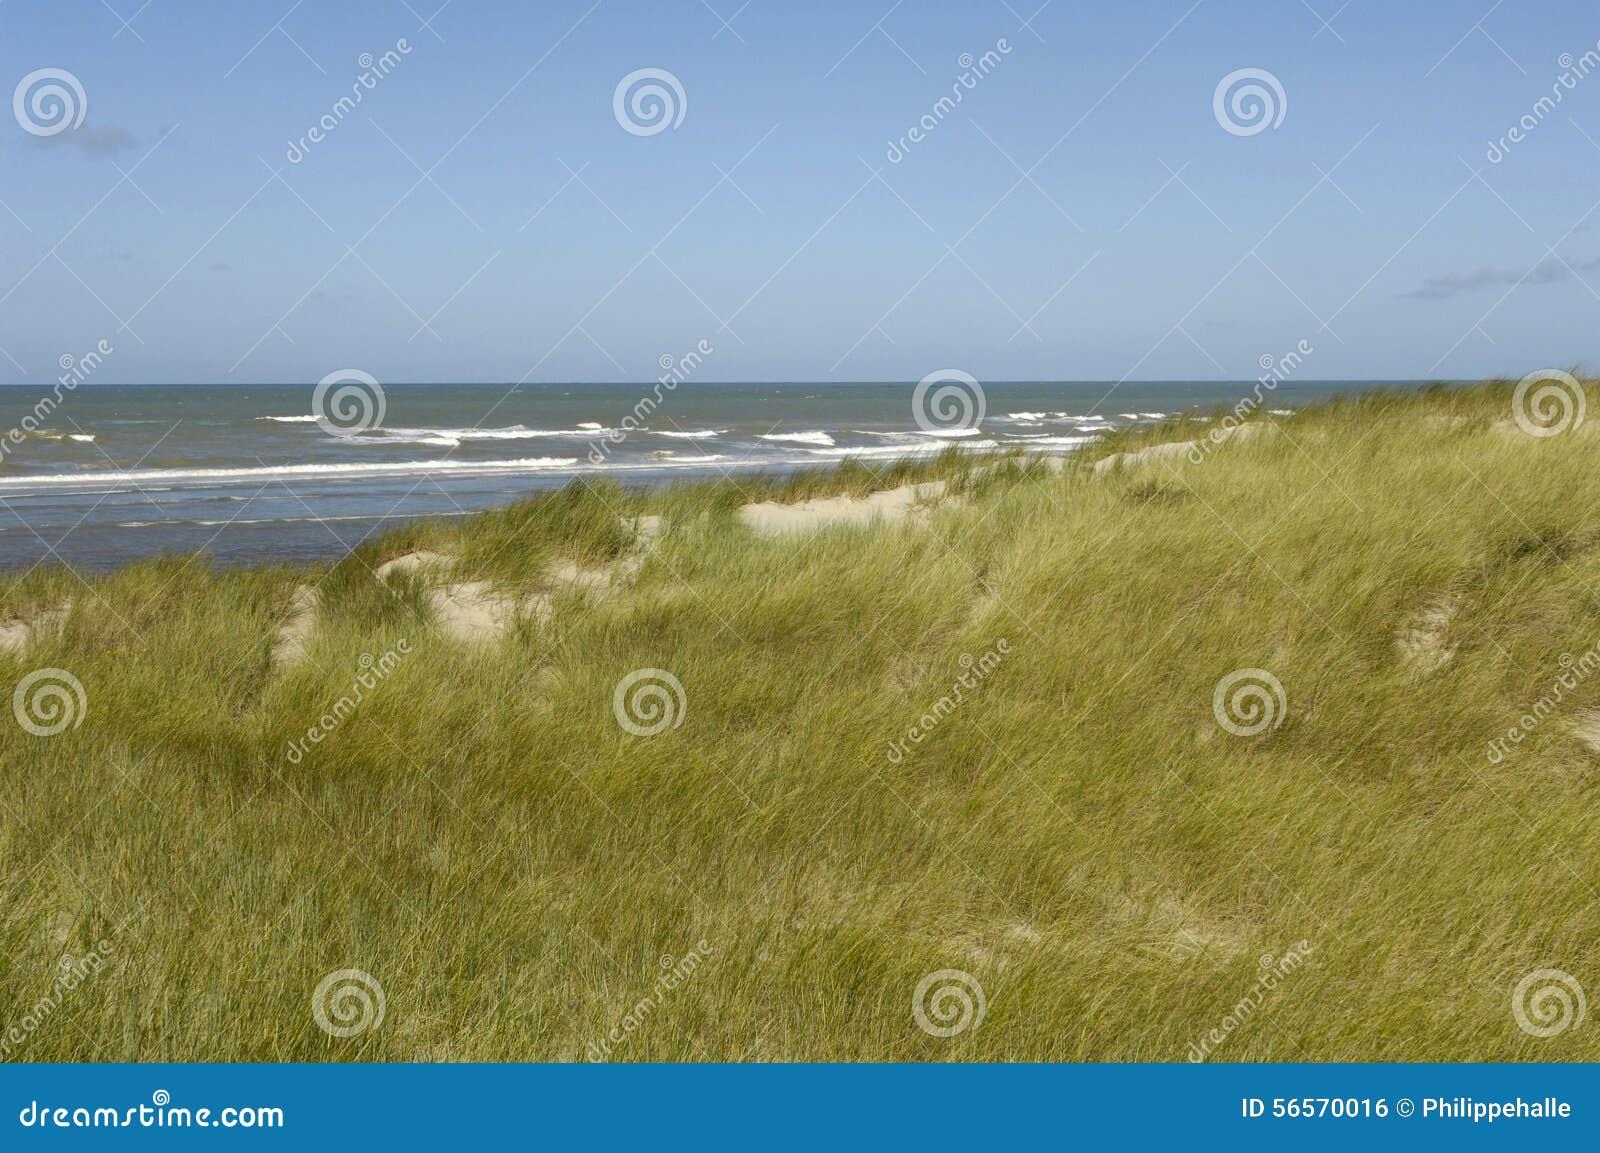 Download Παραλία της κηλίδας ηλίου LE Touquet Παρίσι στο Nord-Pas-de-Calais Στοκ Εικόνες - εικόνα από αμμόλοφος, παραλία: 56570016